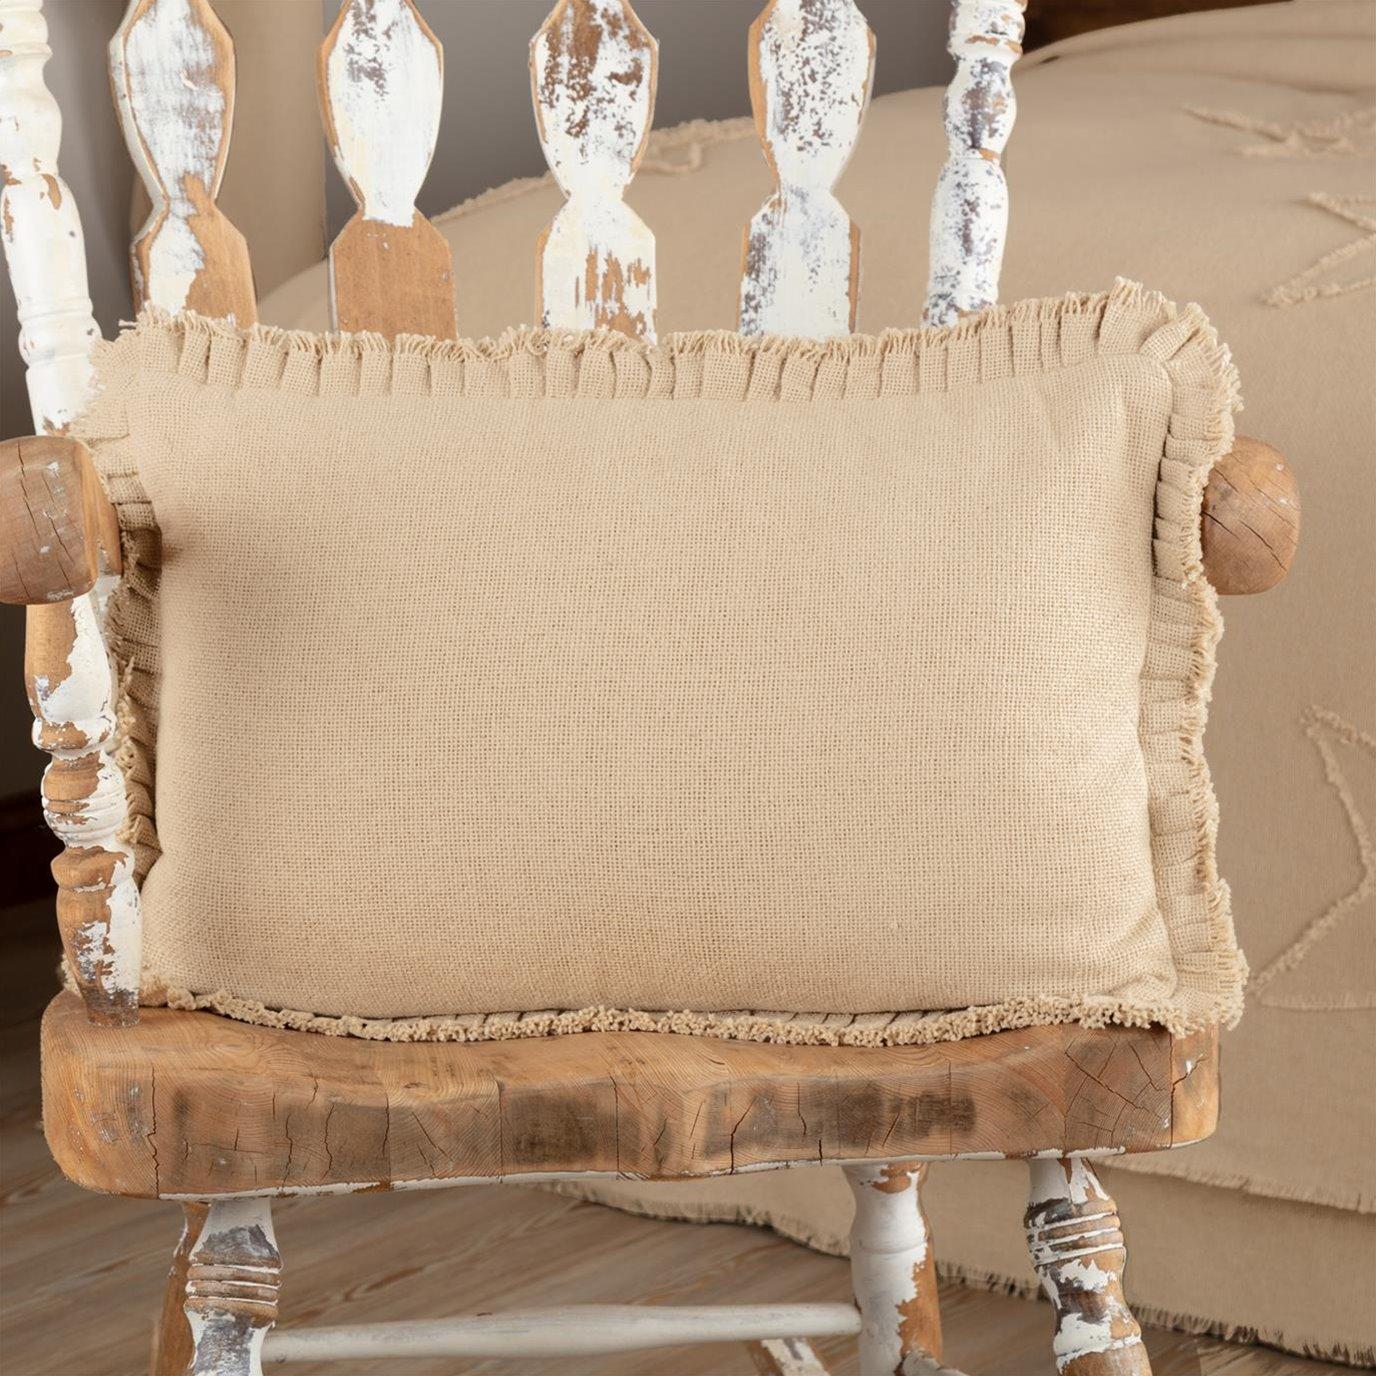 Burlap Vintage Pillow w/ Fringed Ruffle 14x22